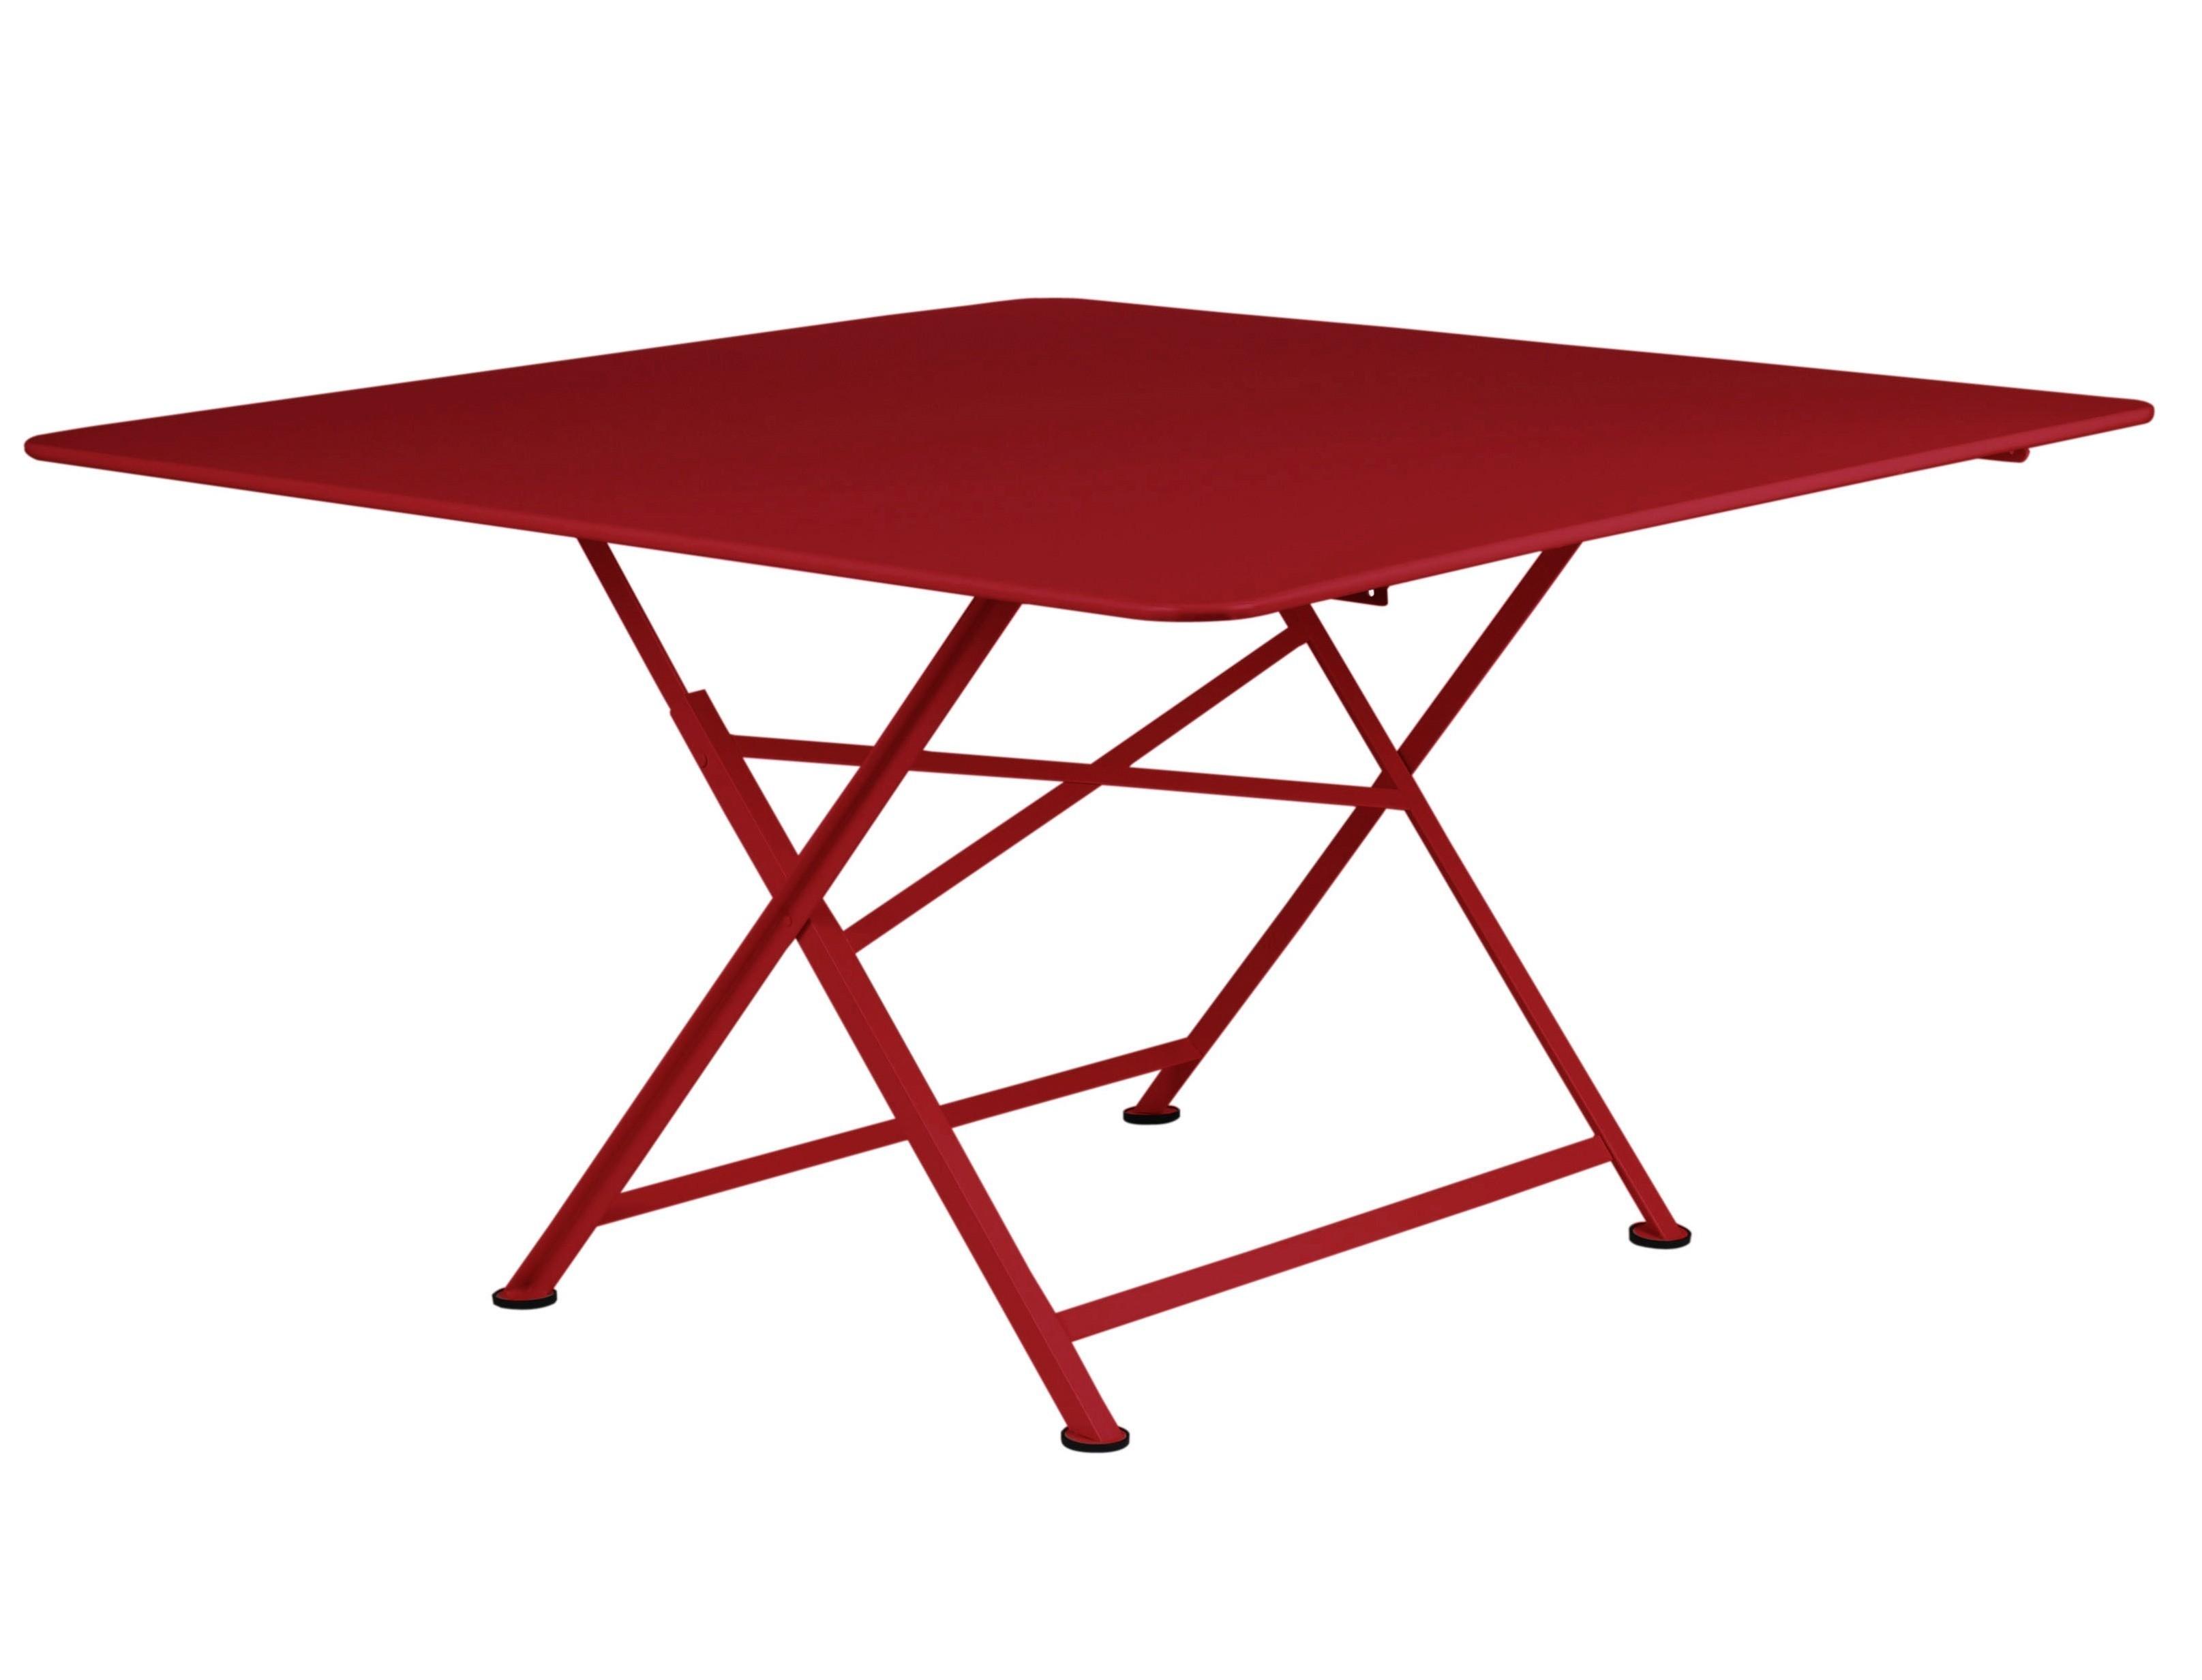 table pliante cargo de fermob piment. Black Bedroom Furniture Sets. Home Design Ideas